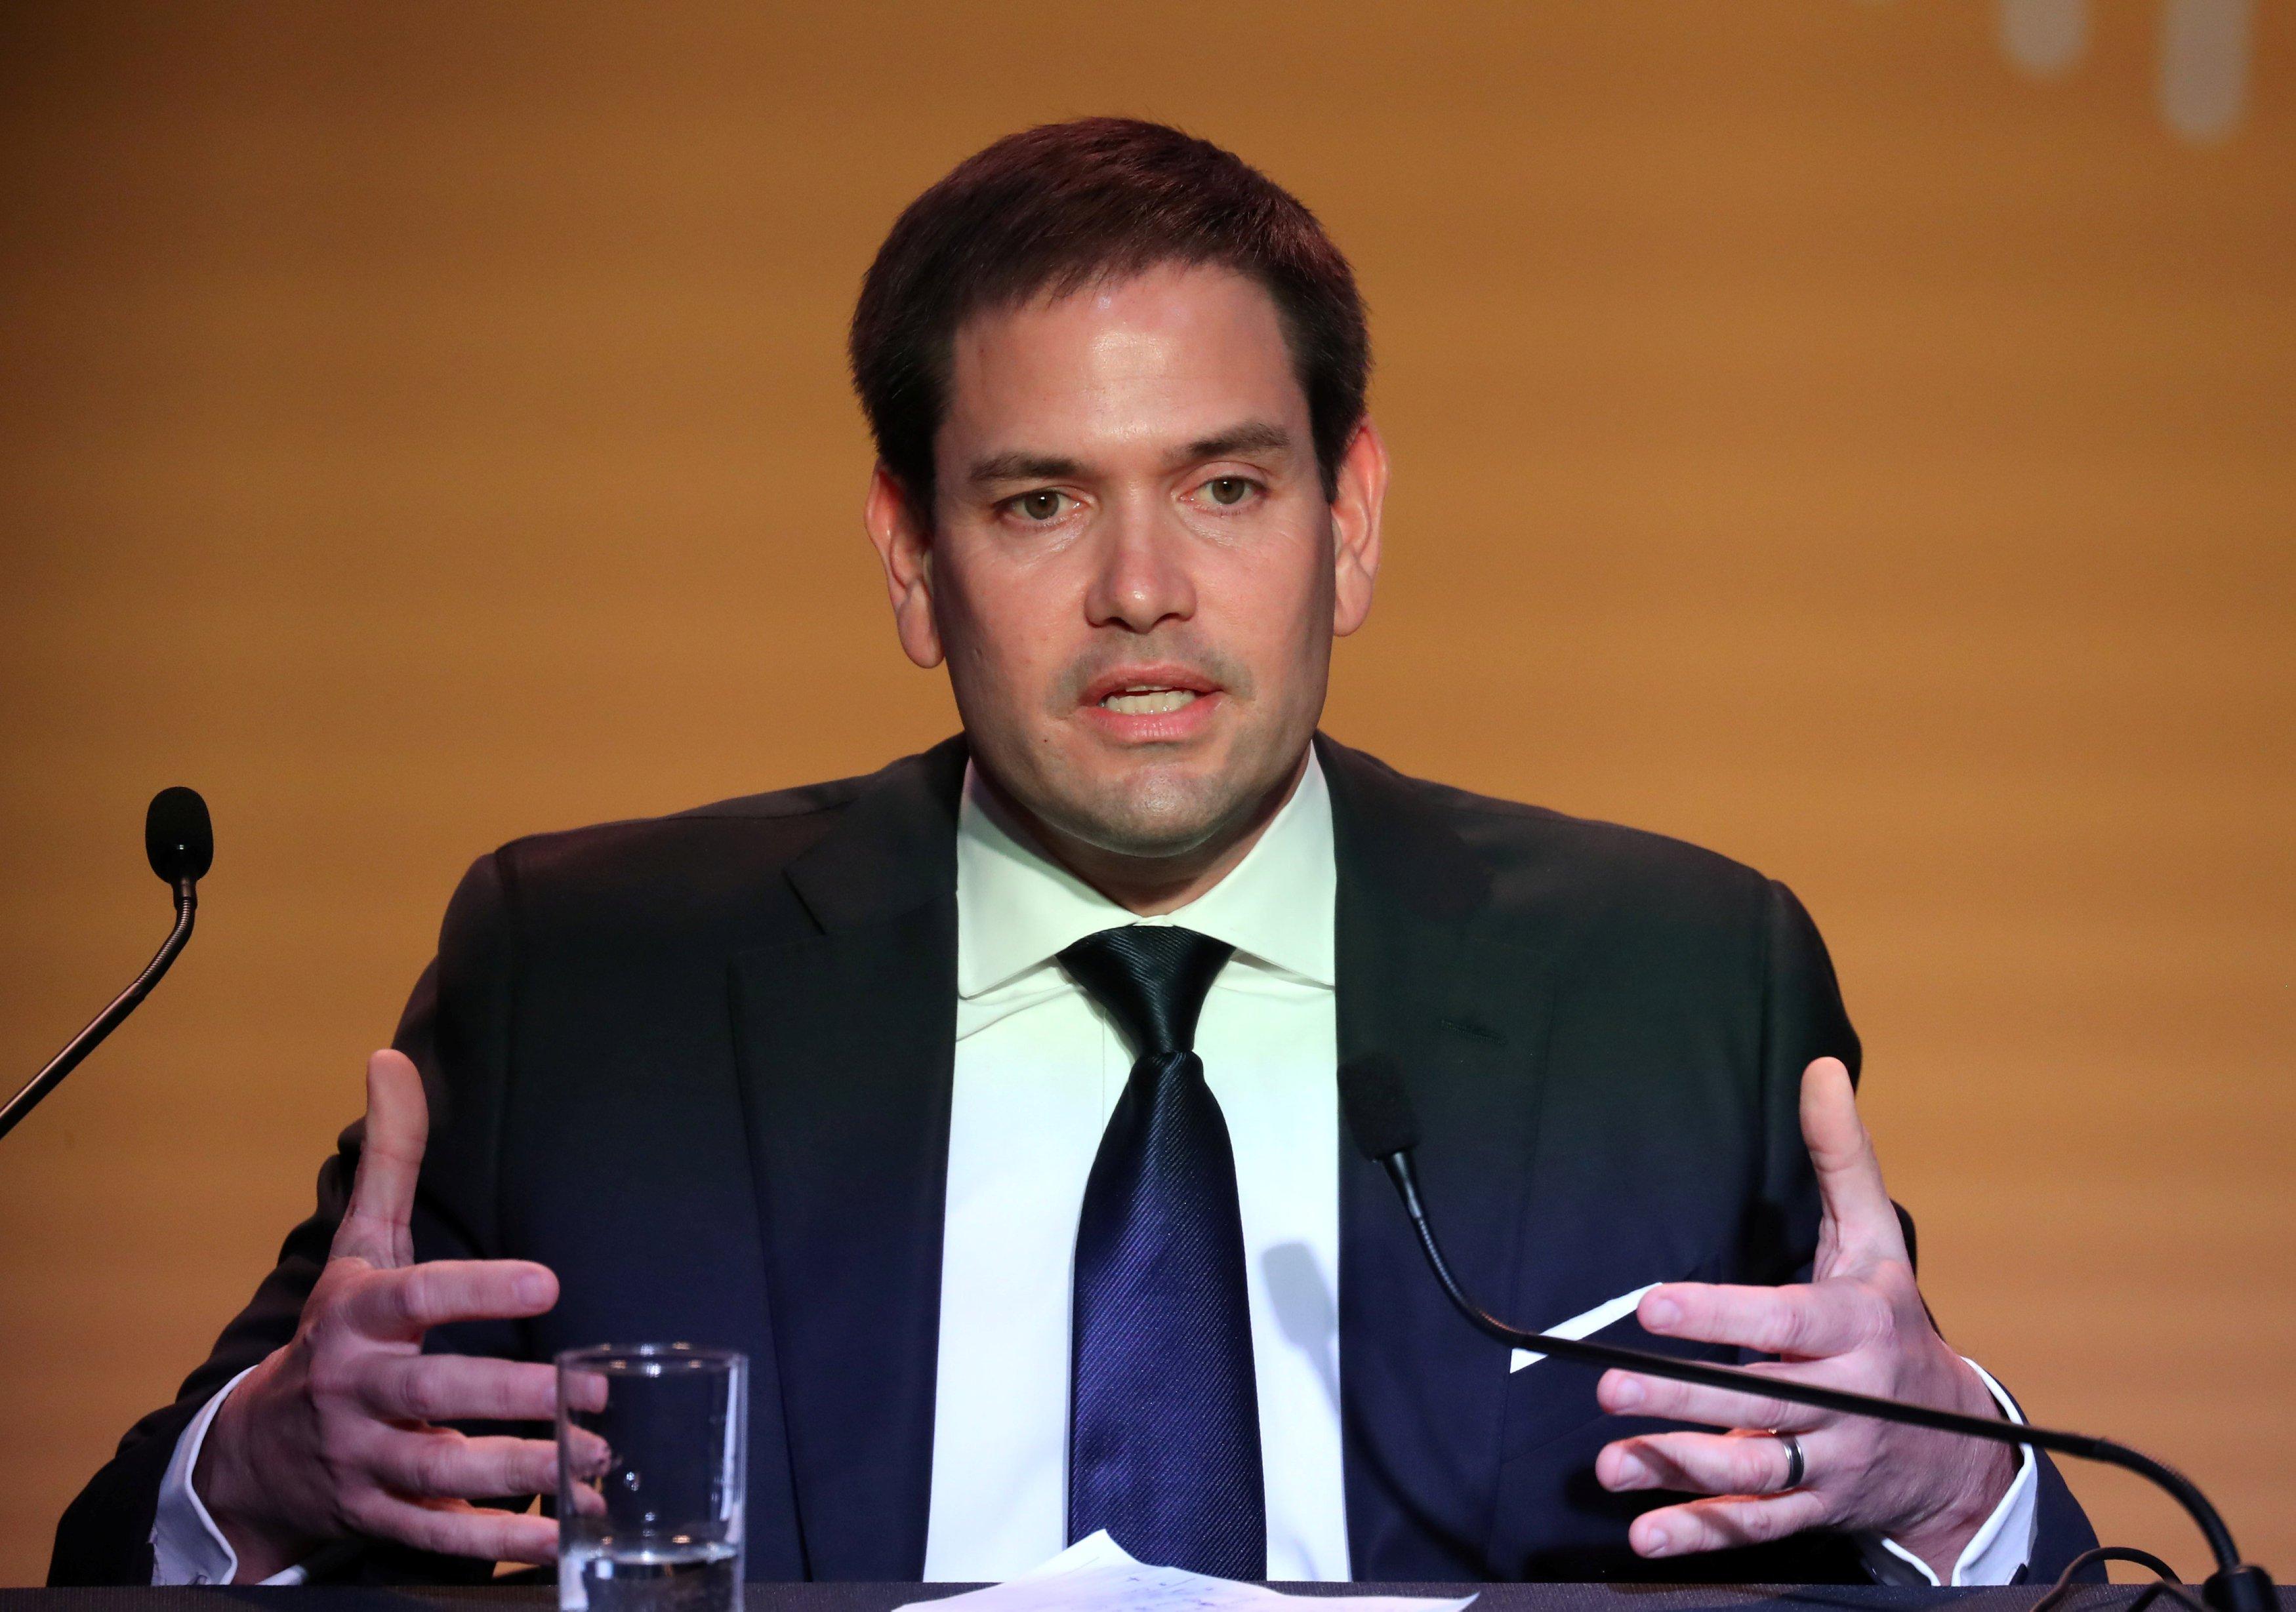 U.S. Senator Marco Rubio /REUTERS/Marcos Brindicci